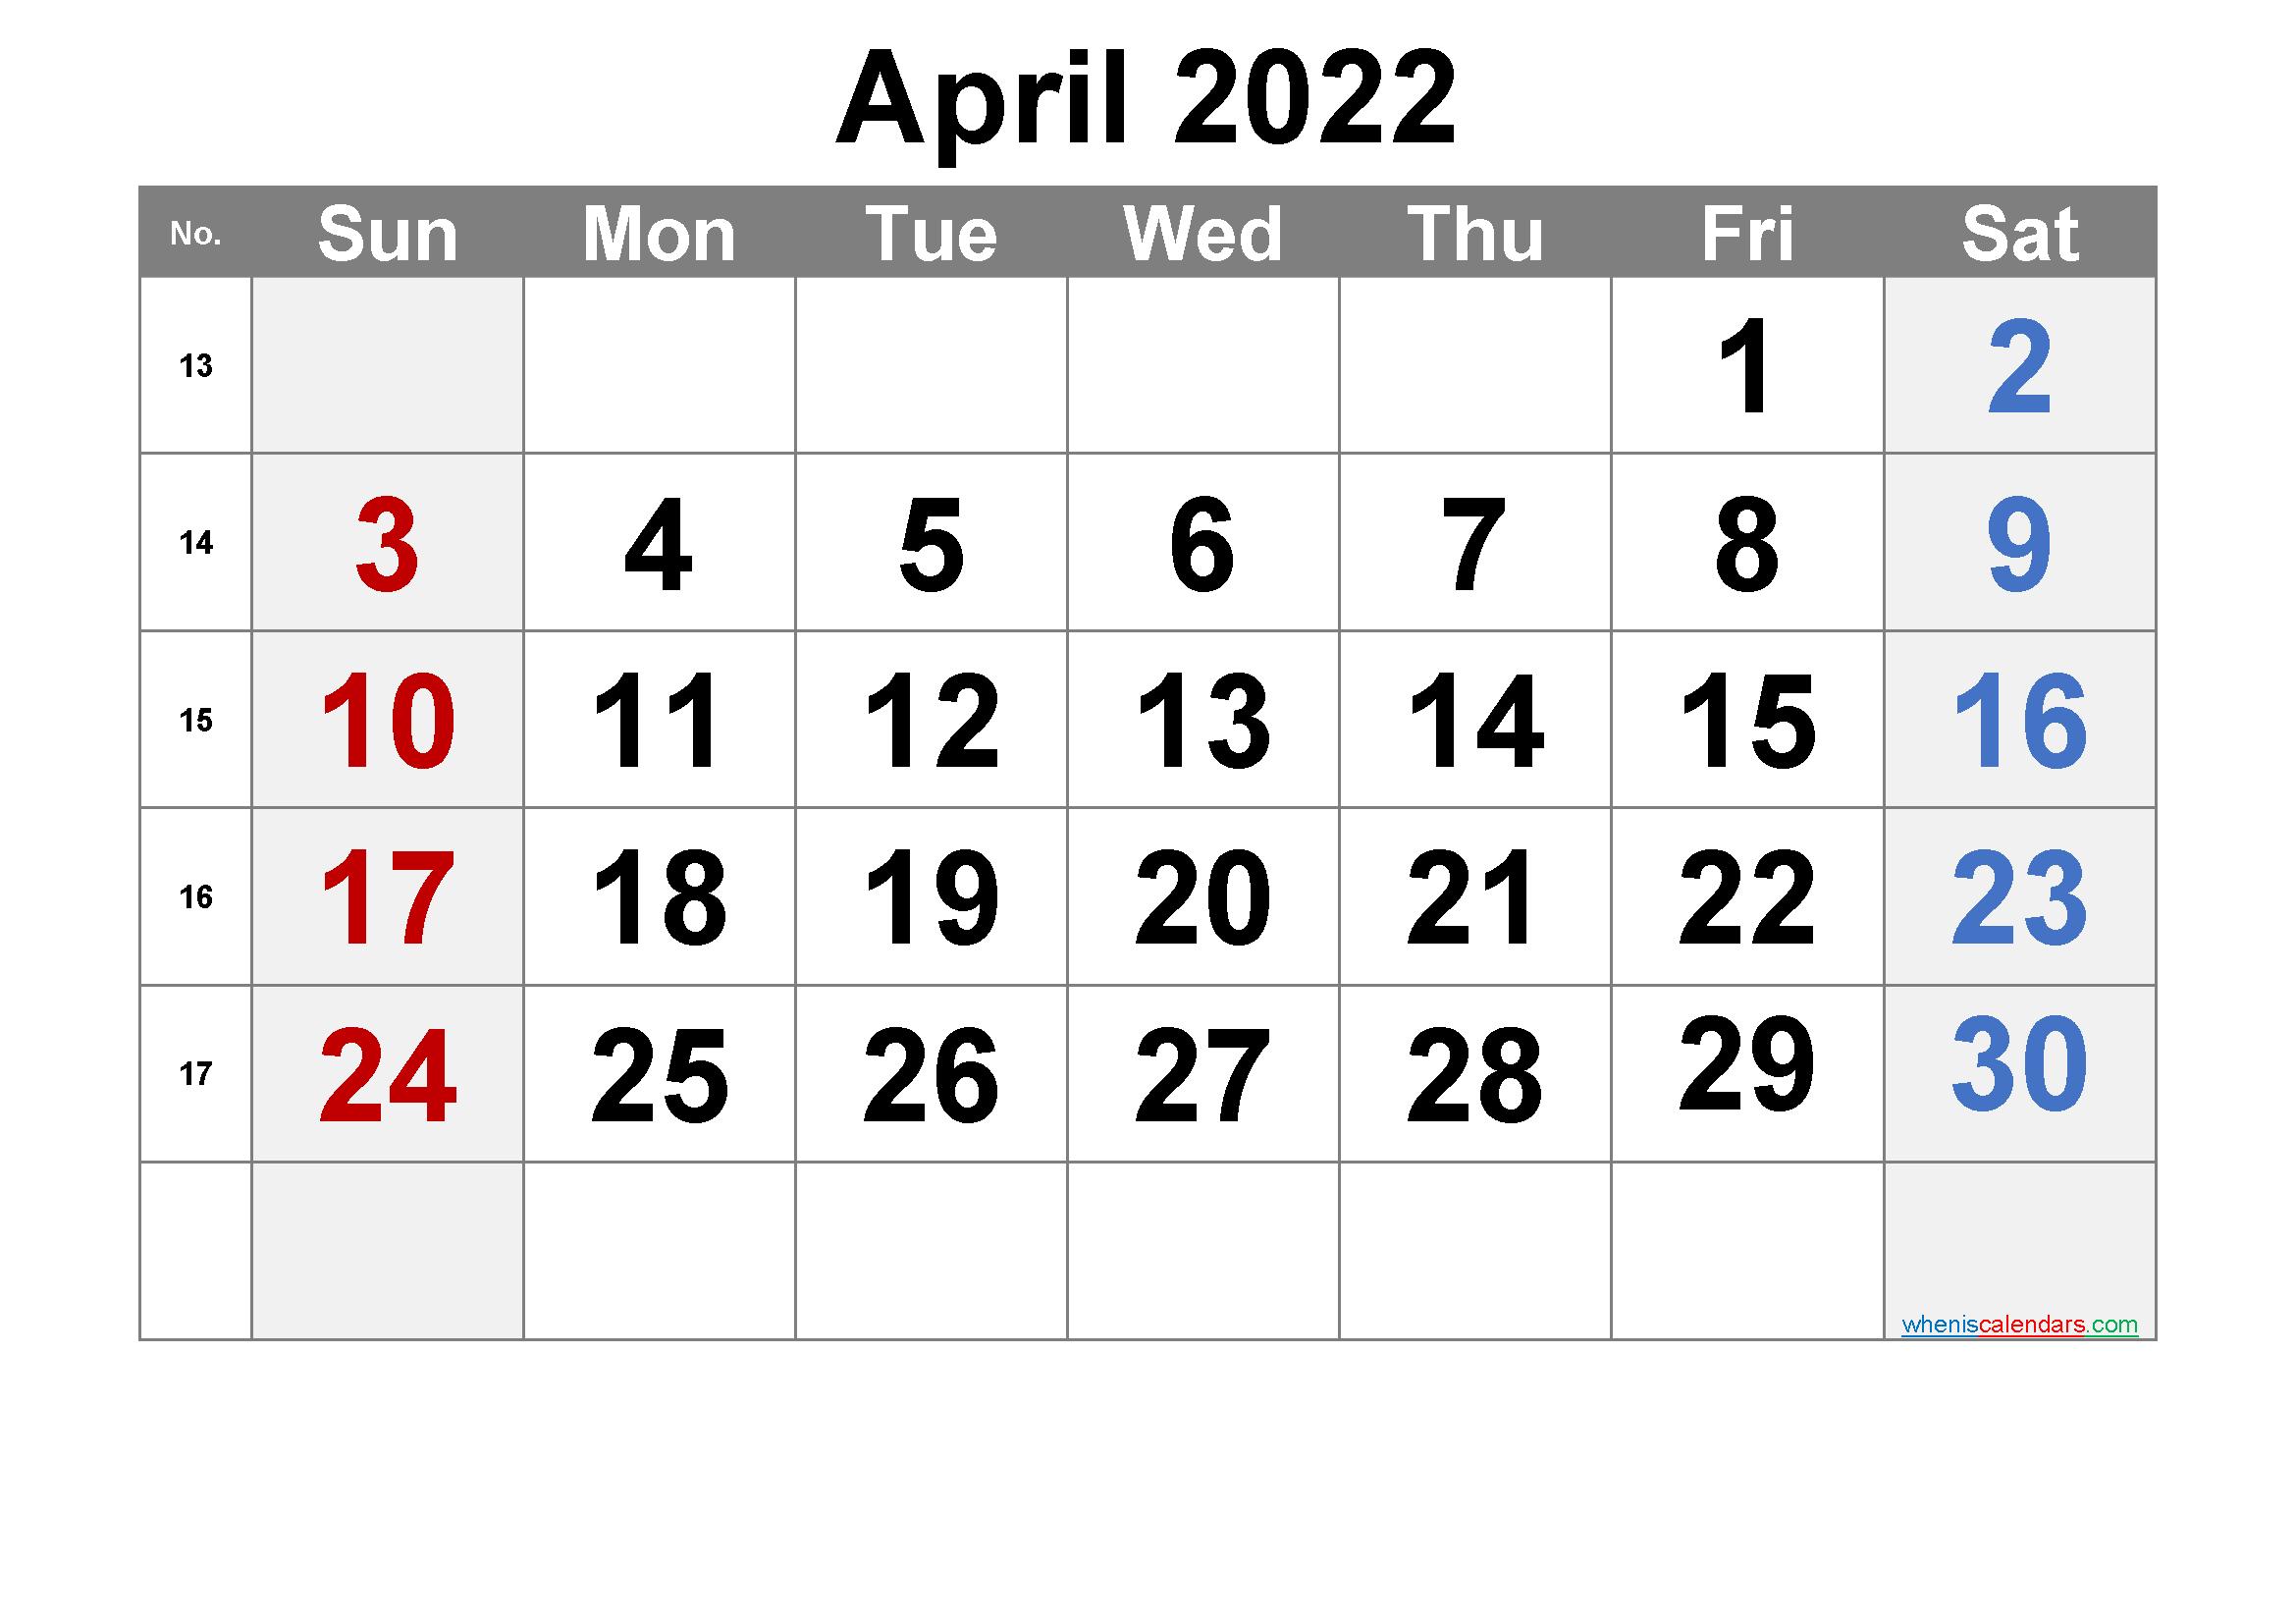 Free April 2022 Calendar With Week Numbers - Free inside 2022 April Calendar Free Printable